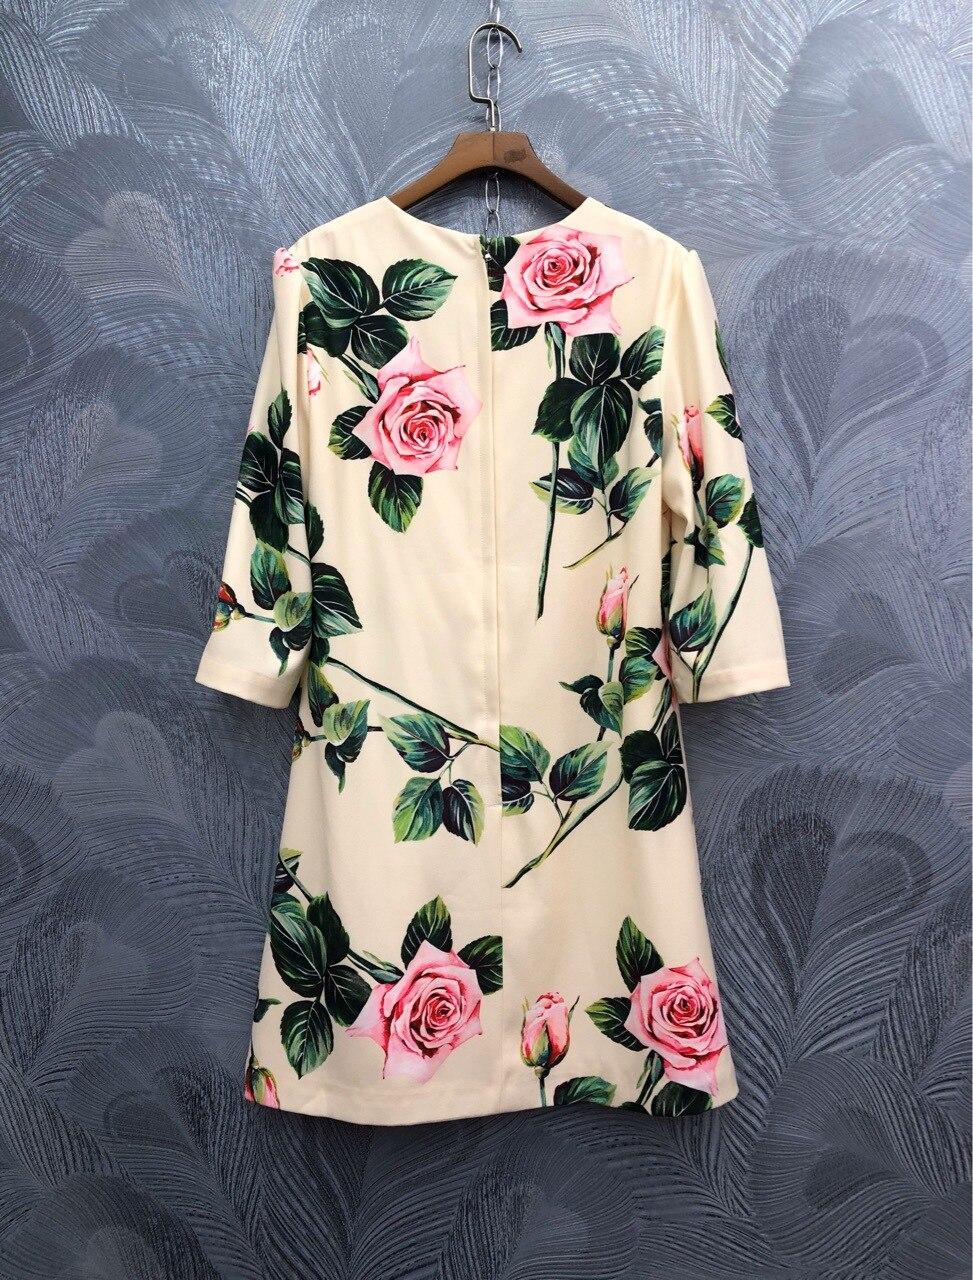 Spring summer runways floral print half sleeve sweet dress Fashion women's elegant dress B229 2